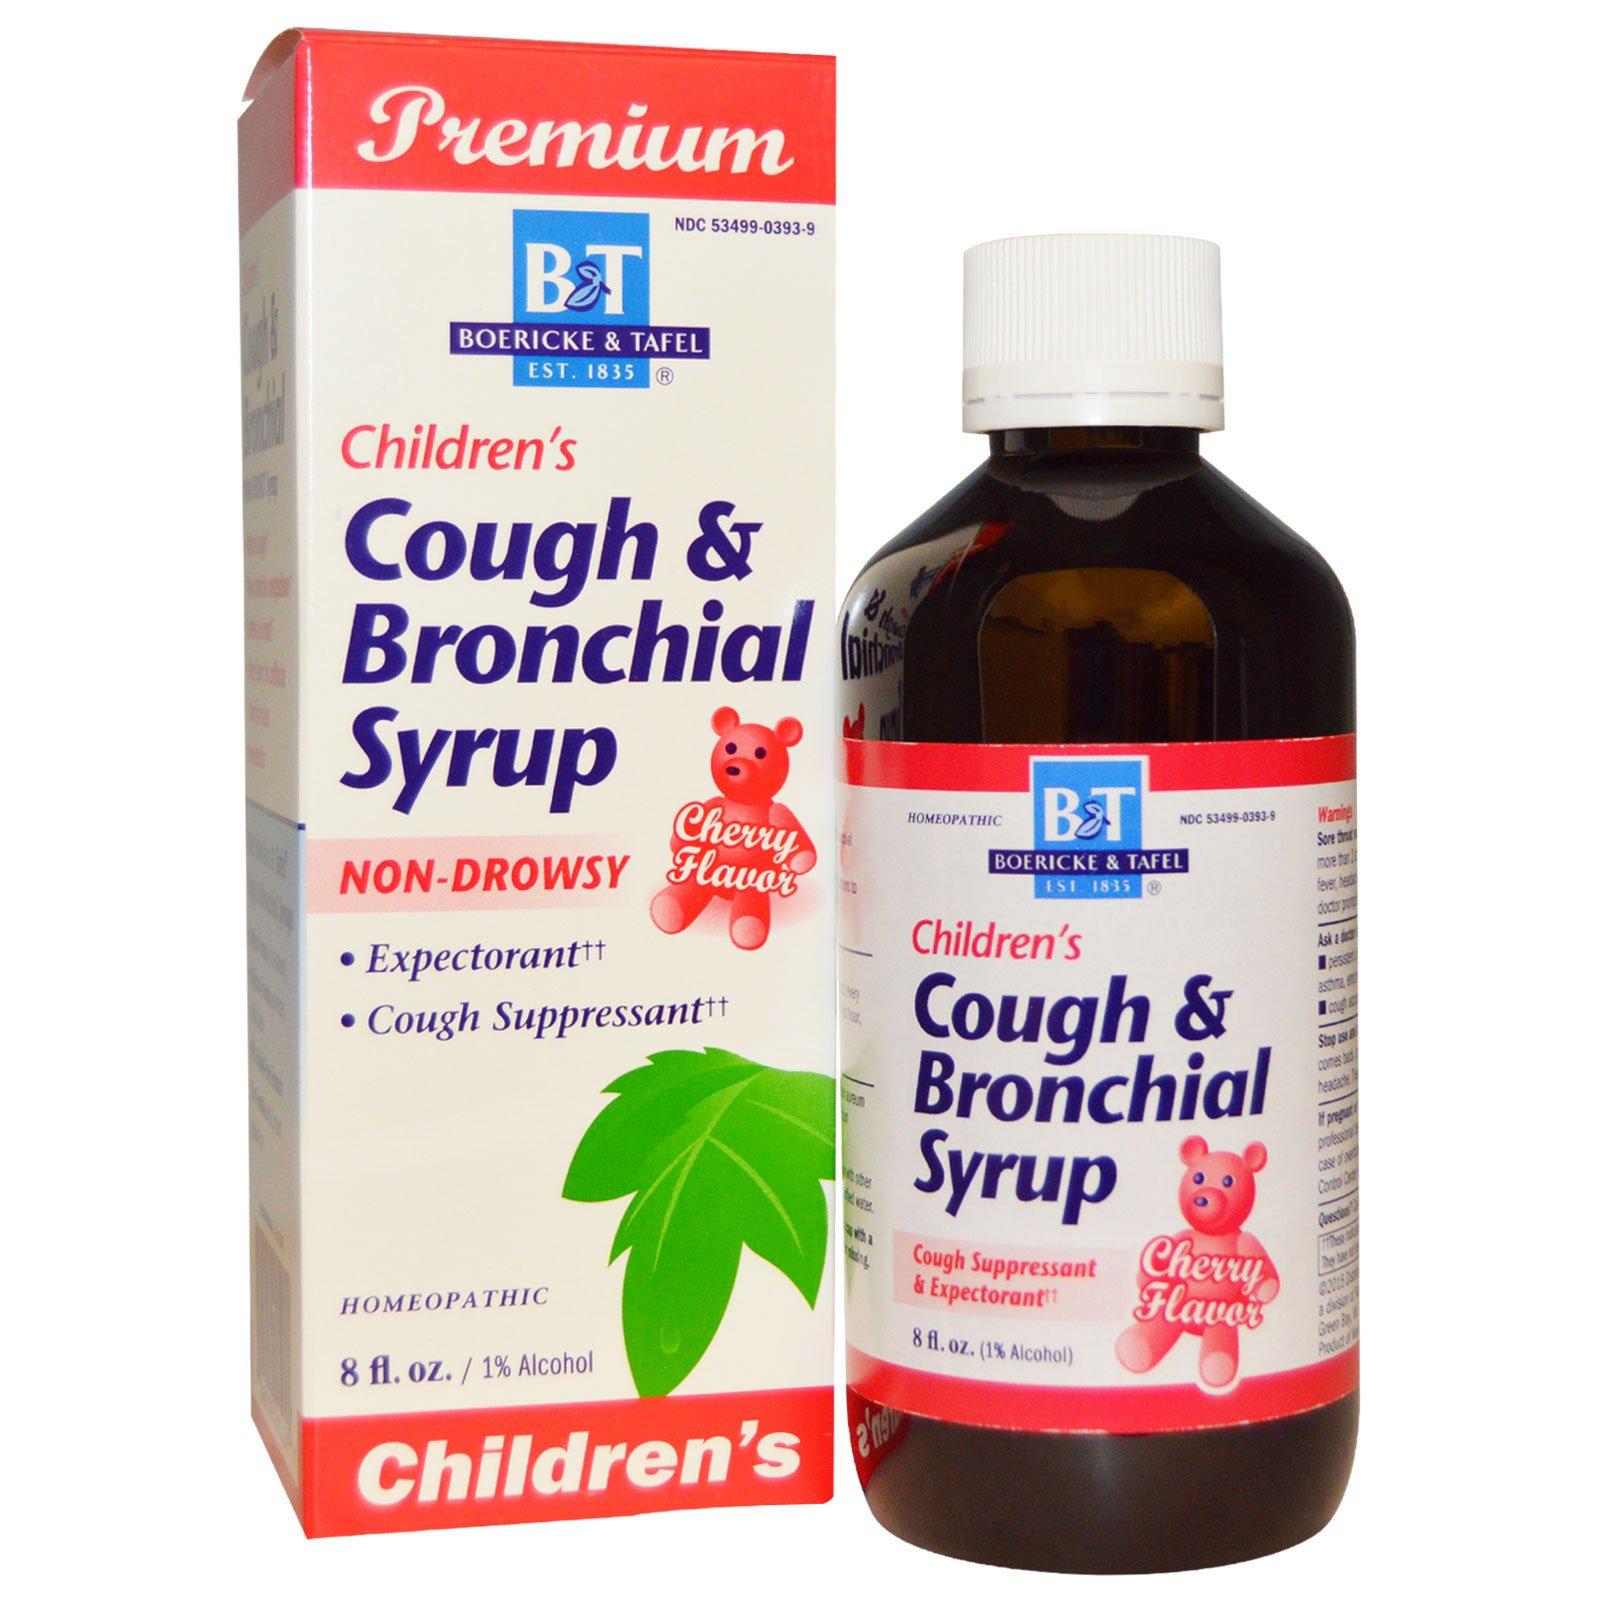 Boericke & Tafel Premium Children's Cough & Bronchial ...